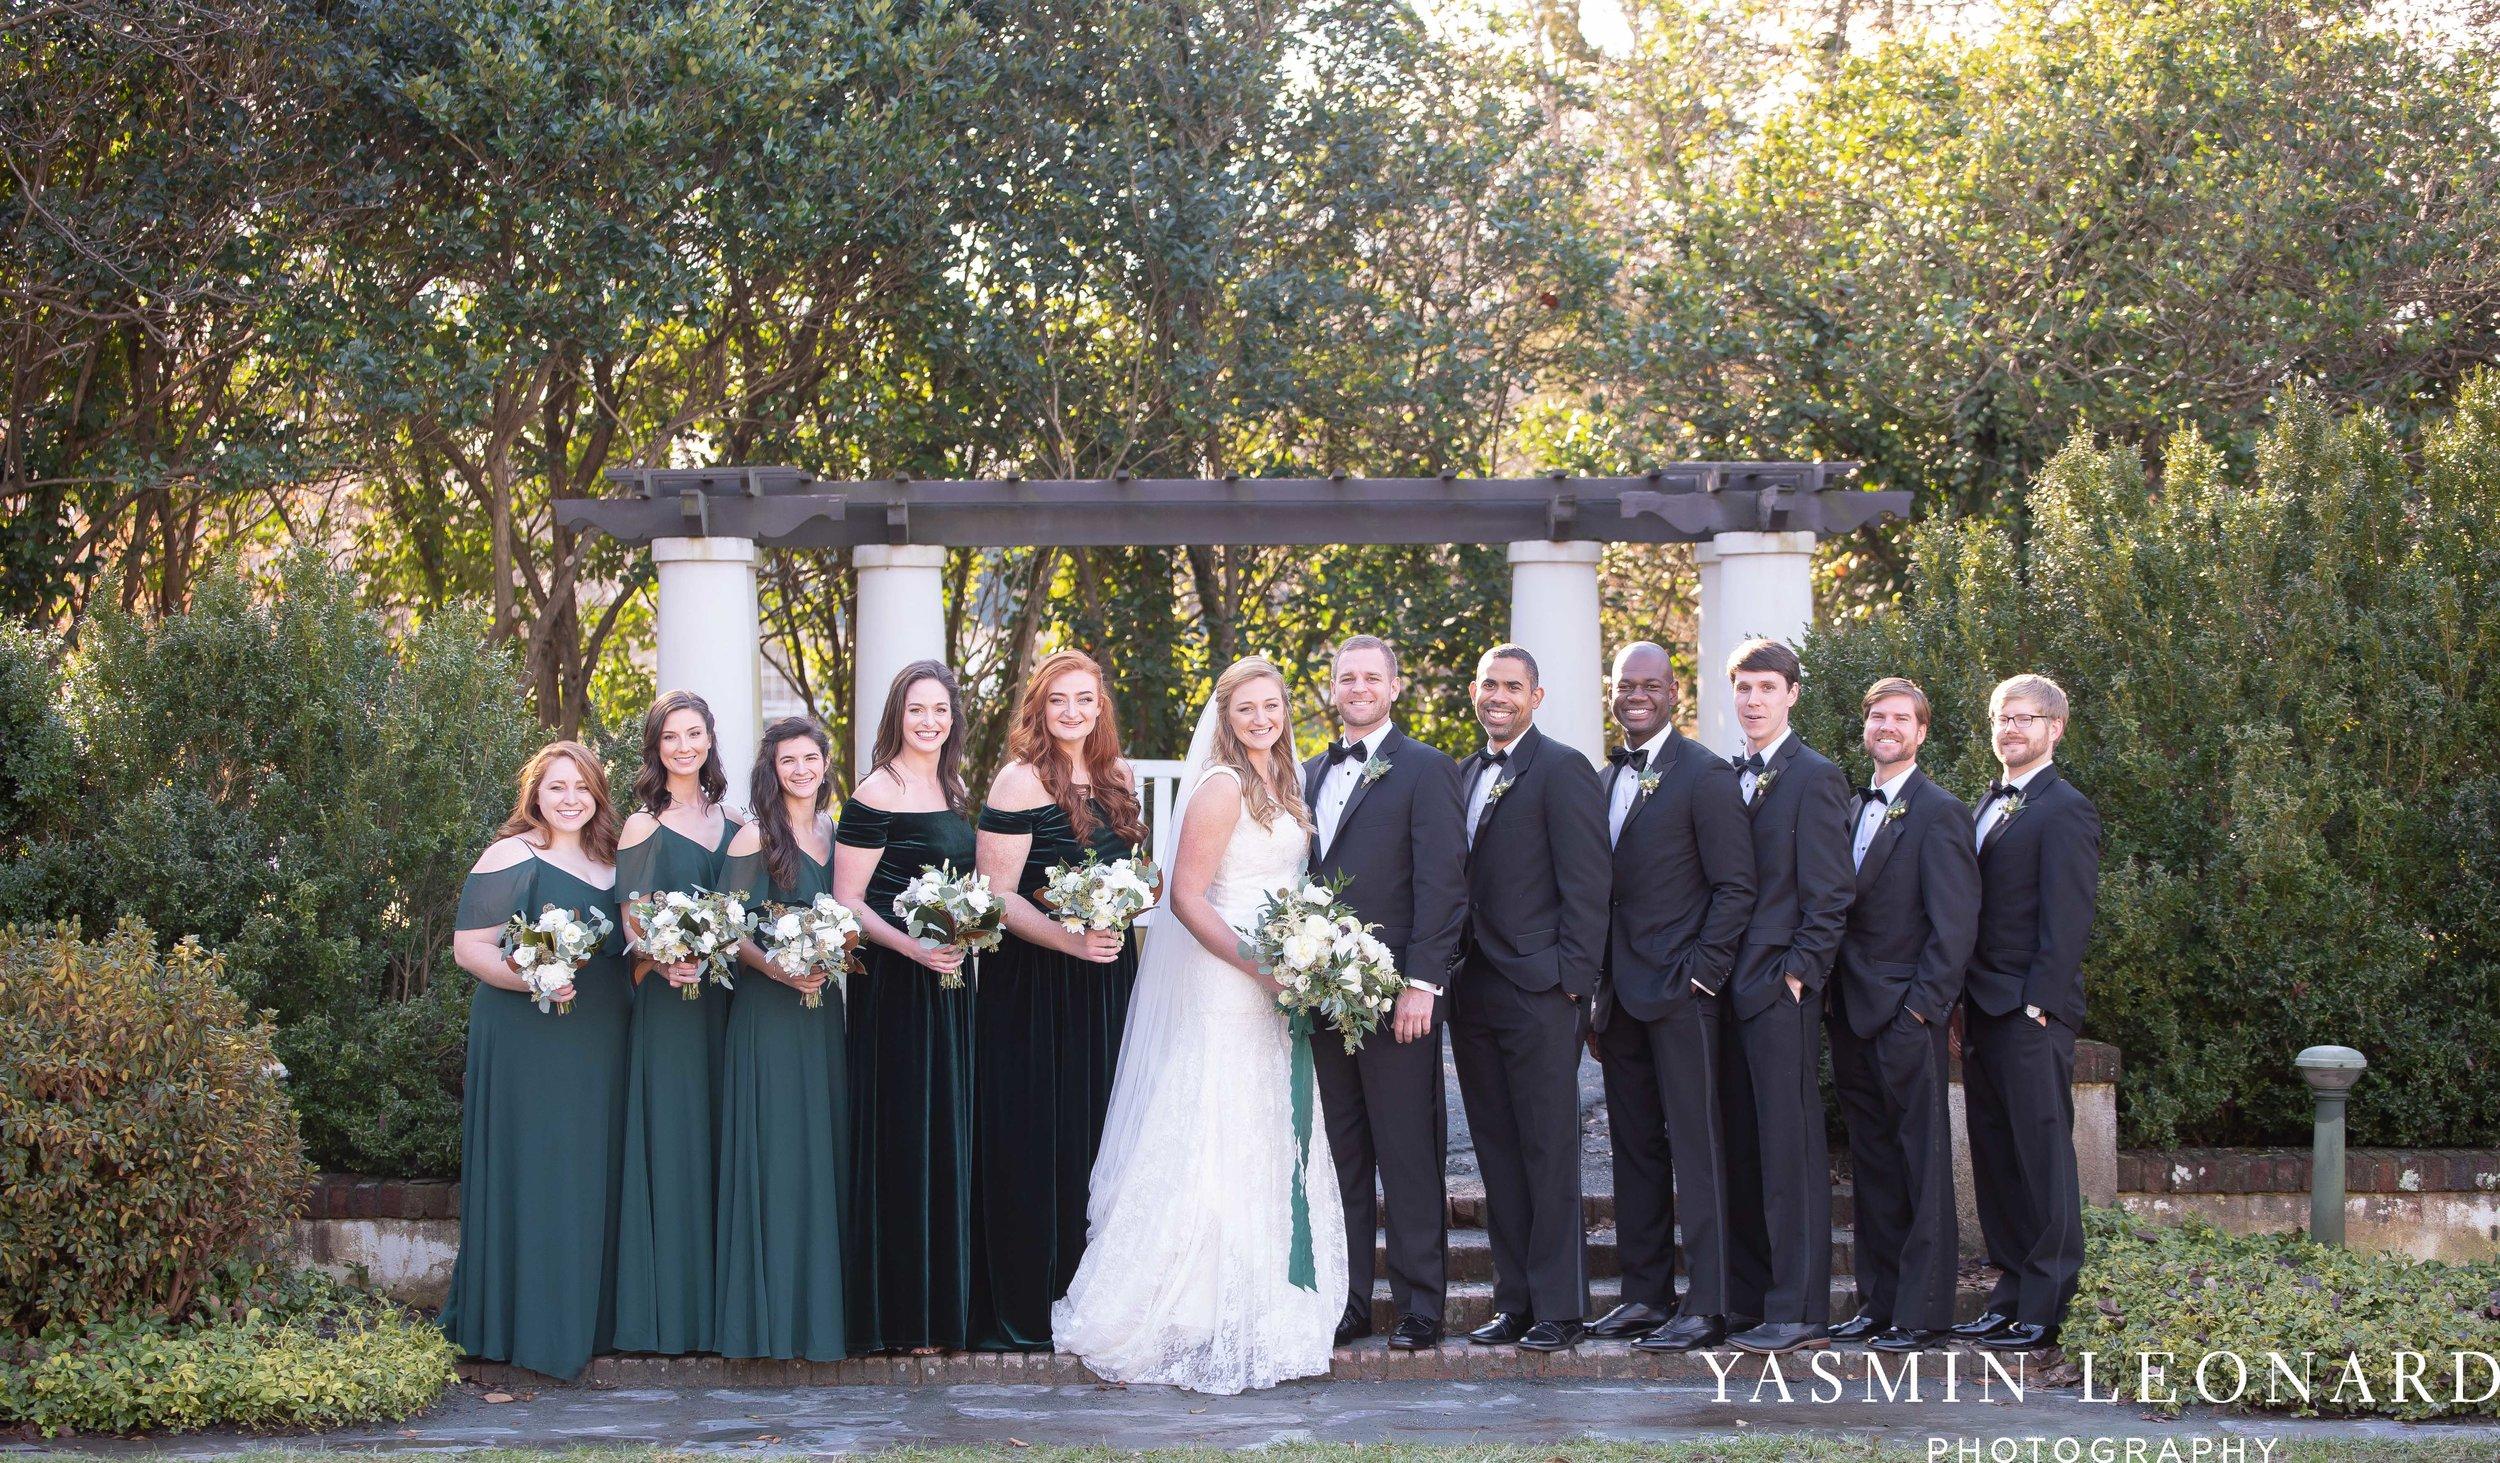 Barn at Reynolda Village - Winston Salem Wedding - White and Green Wedding - NC Wedding - NC Barns - Yasmin Leonard Photography-32.jpg